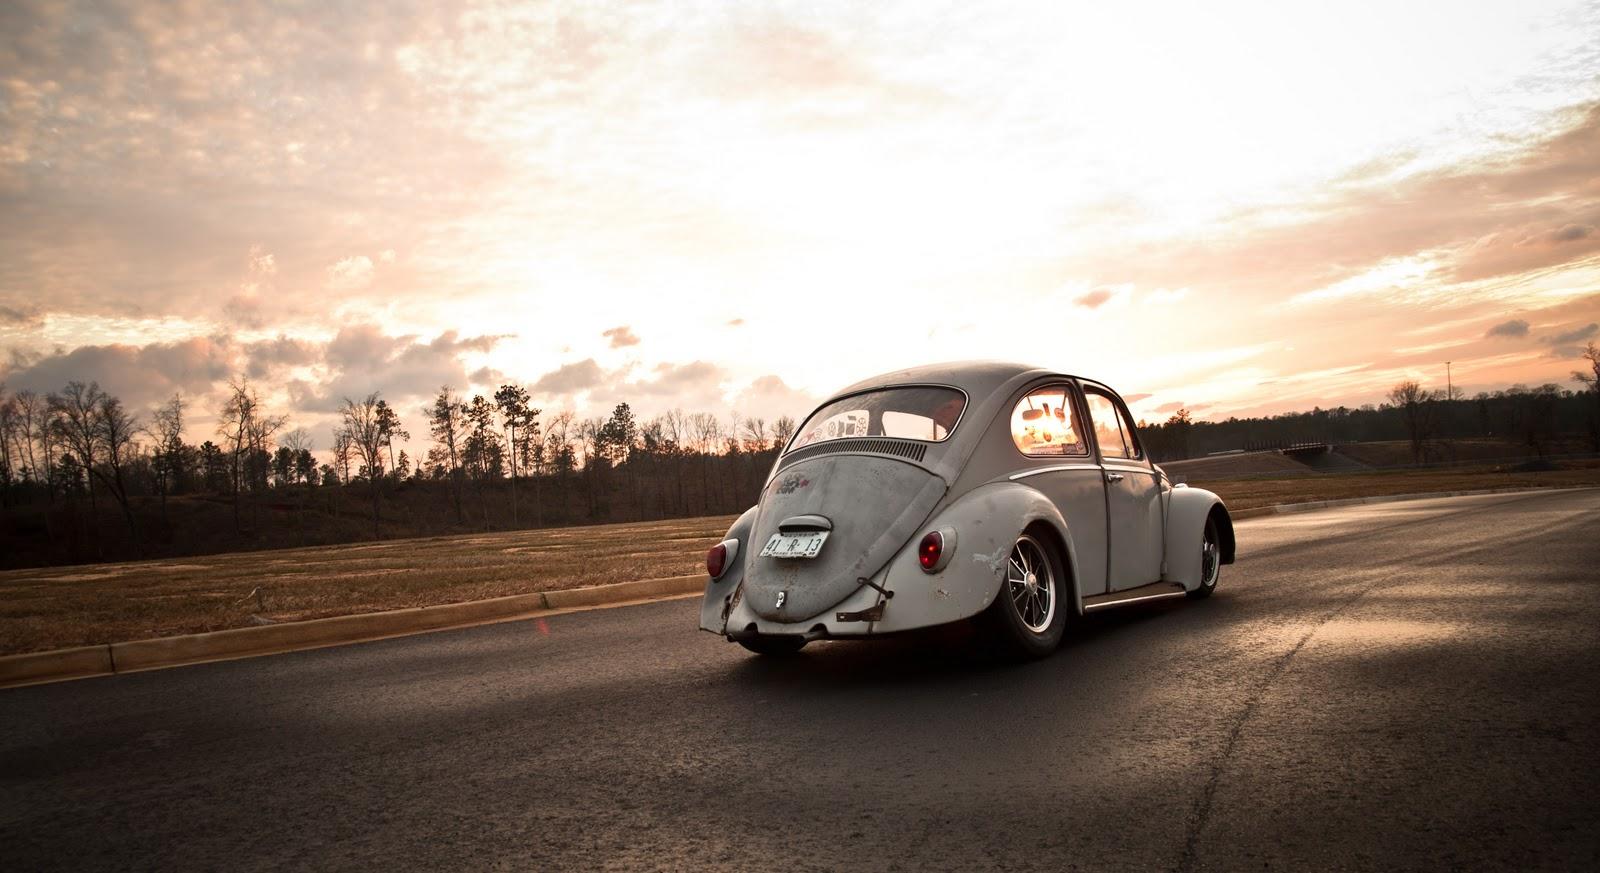 Otis - my '65 Beetle DSC_0020